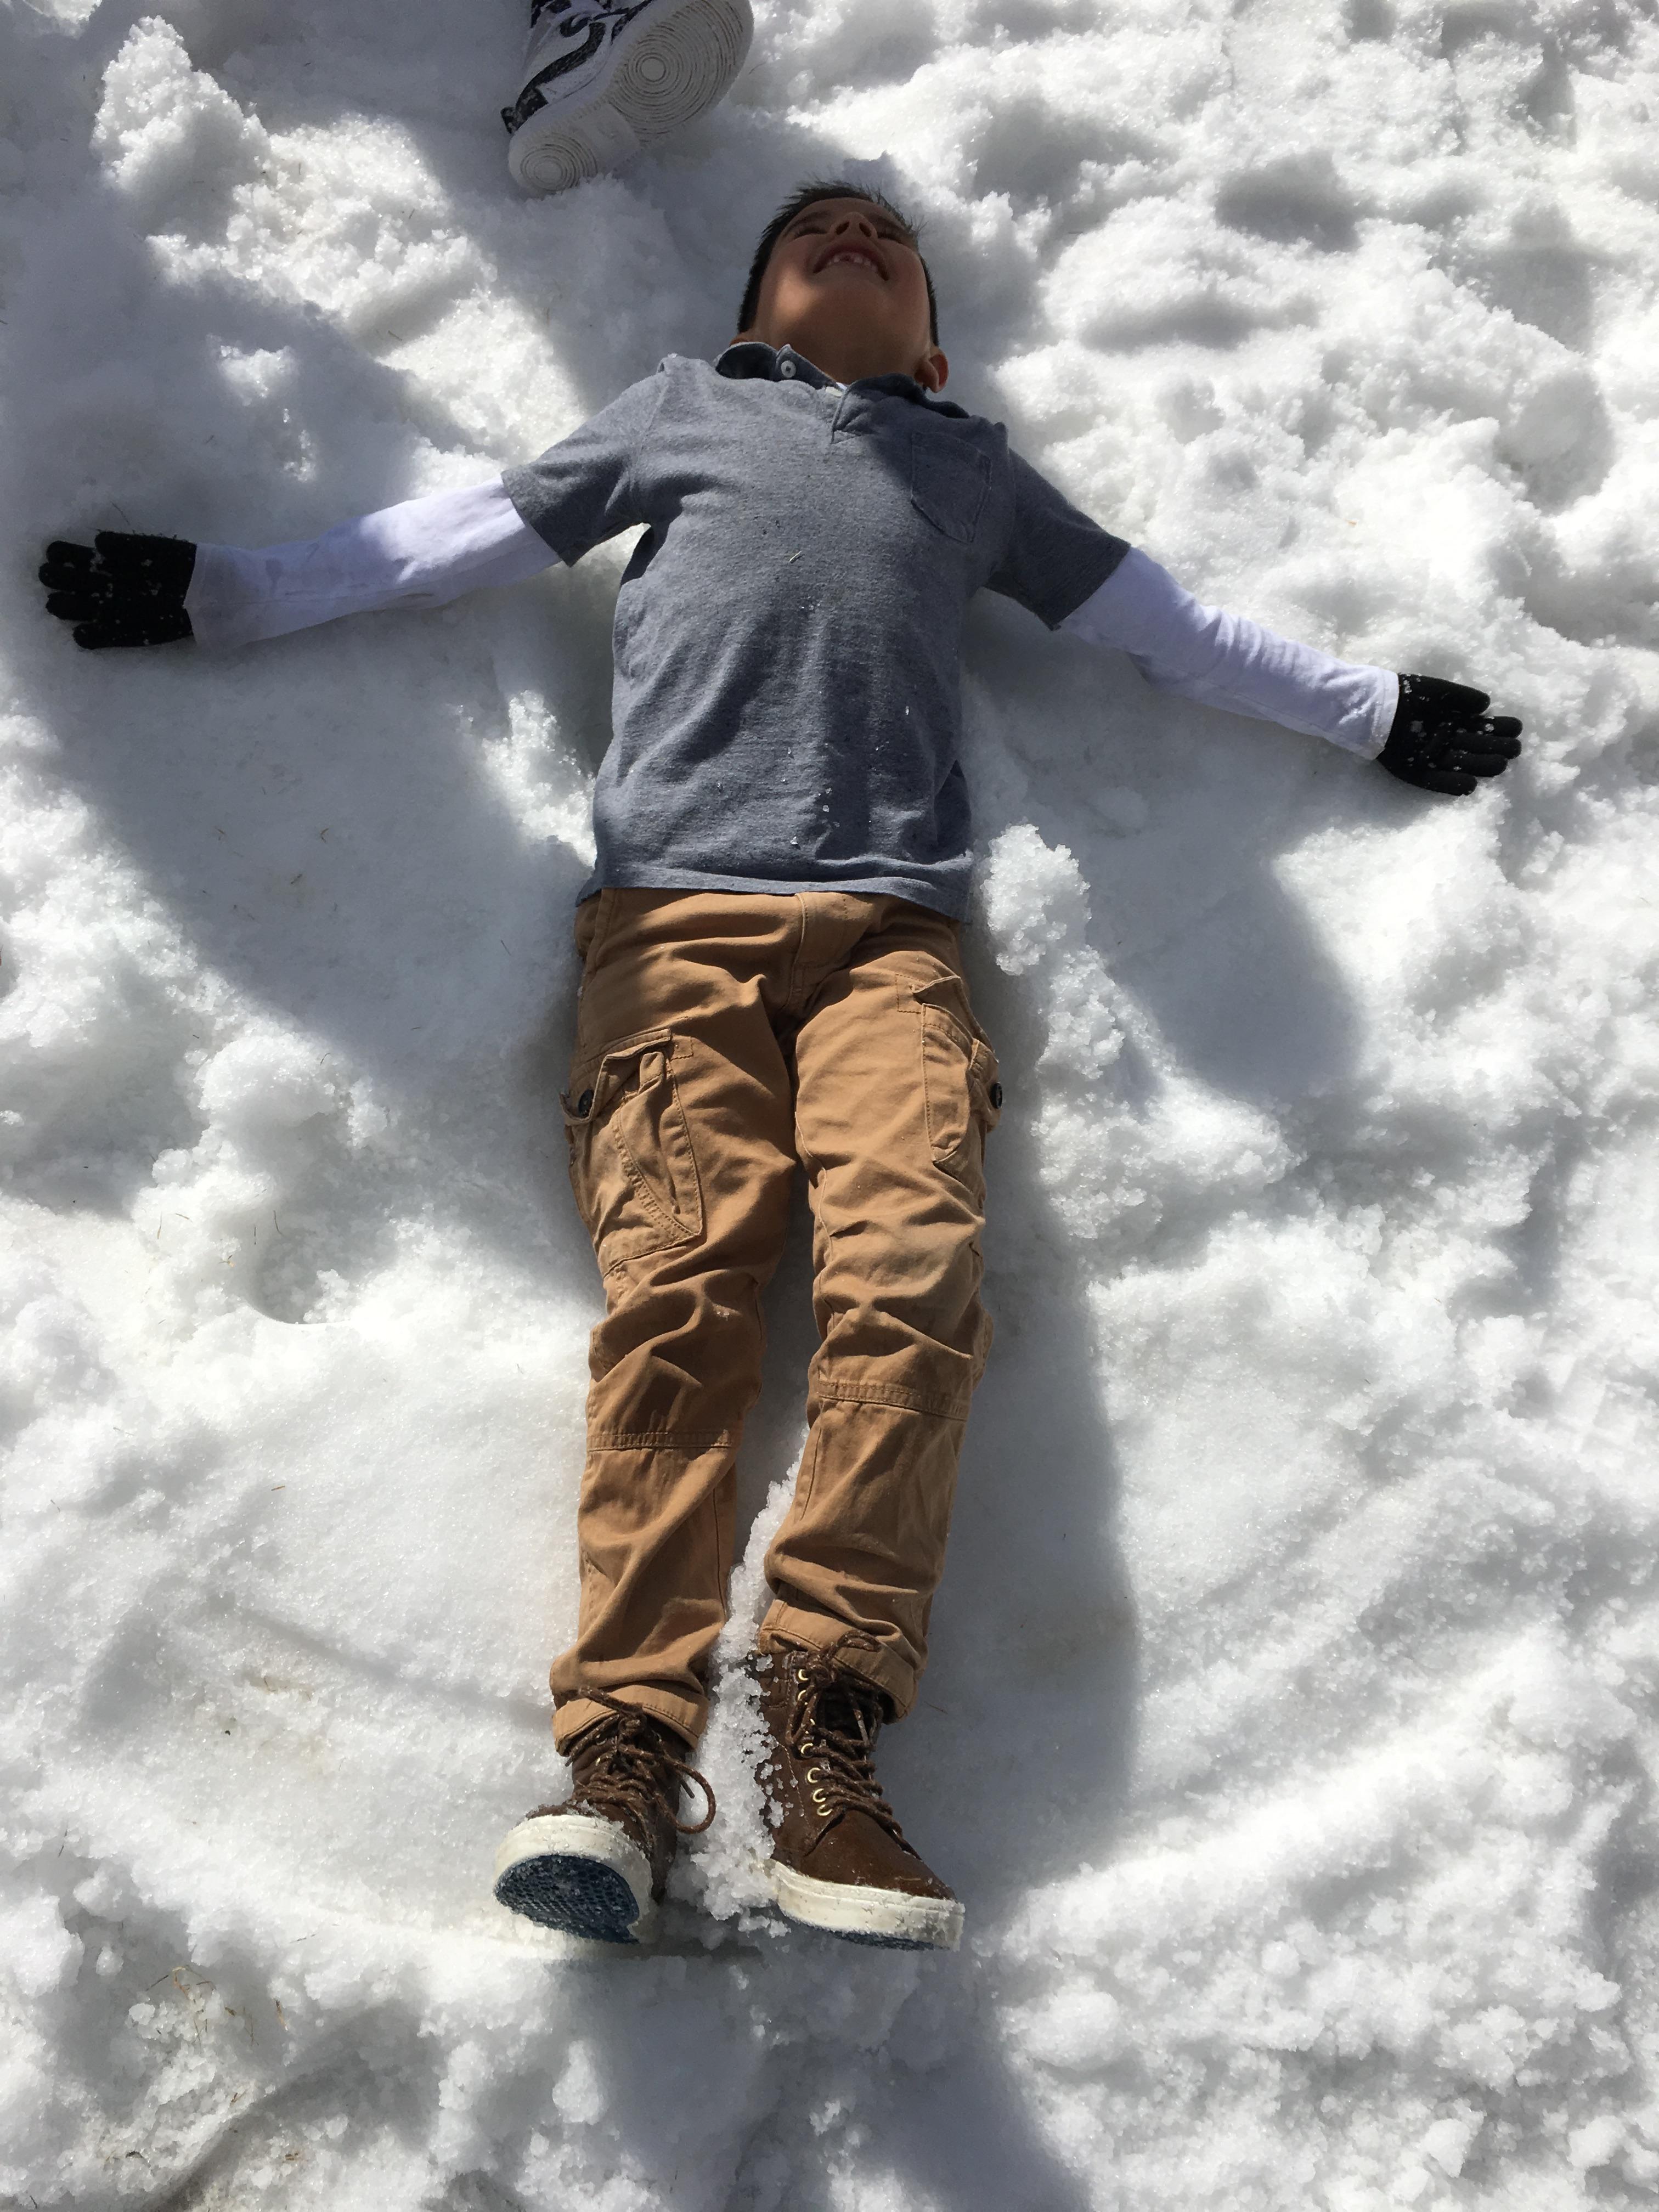 Snow Day Fun! | Principal's Blog